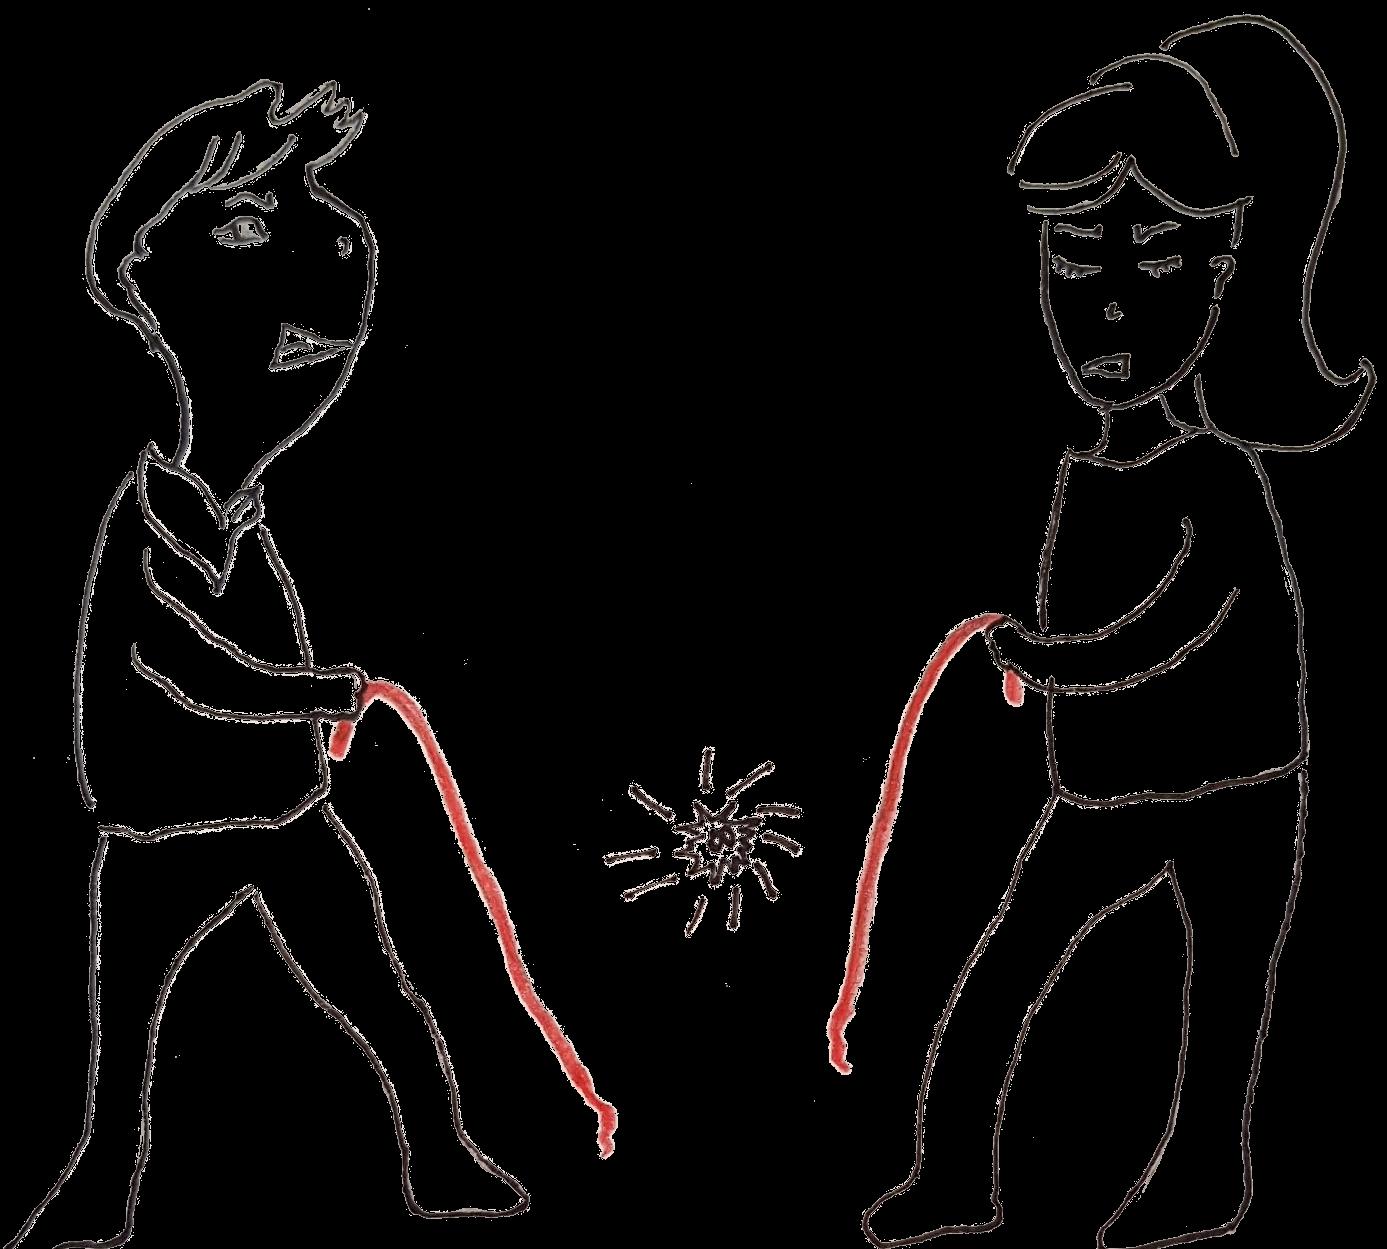 7-Wege-Beziehung-Ruinieren